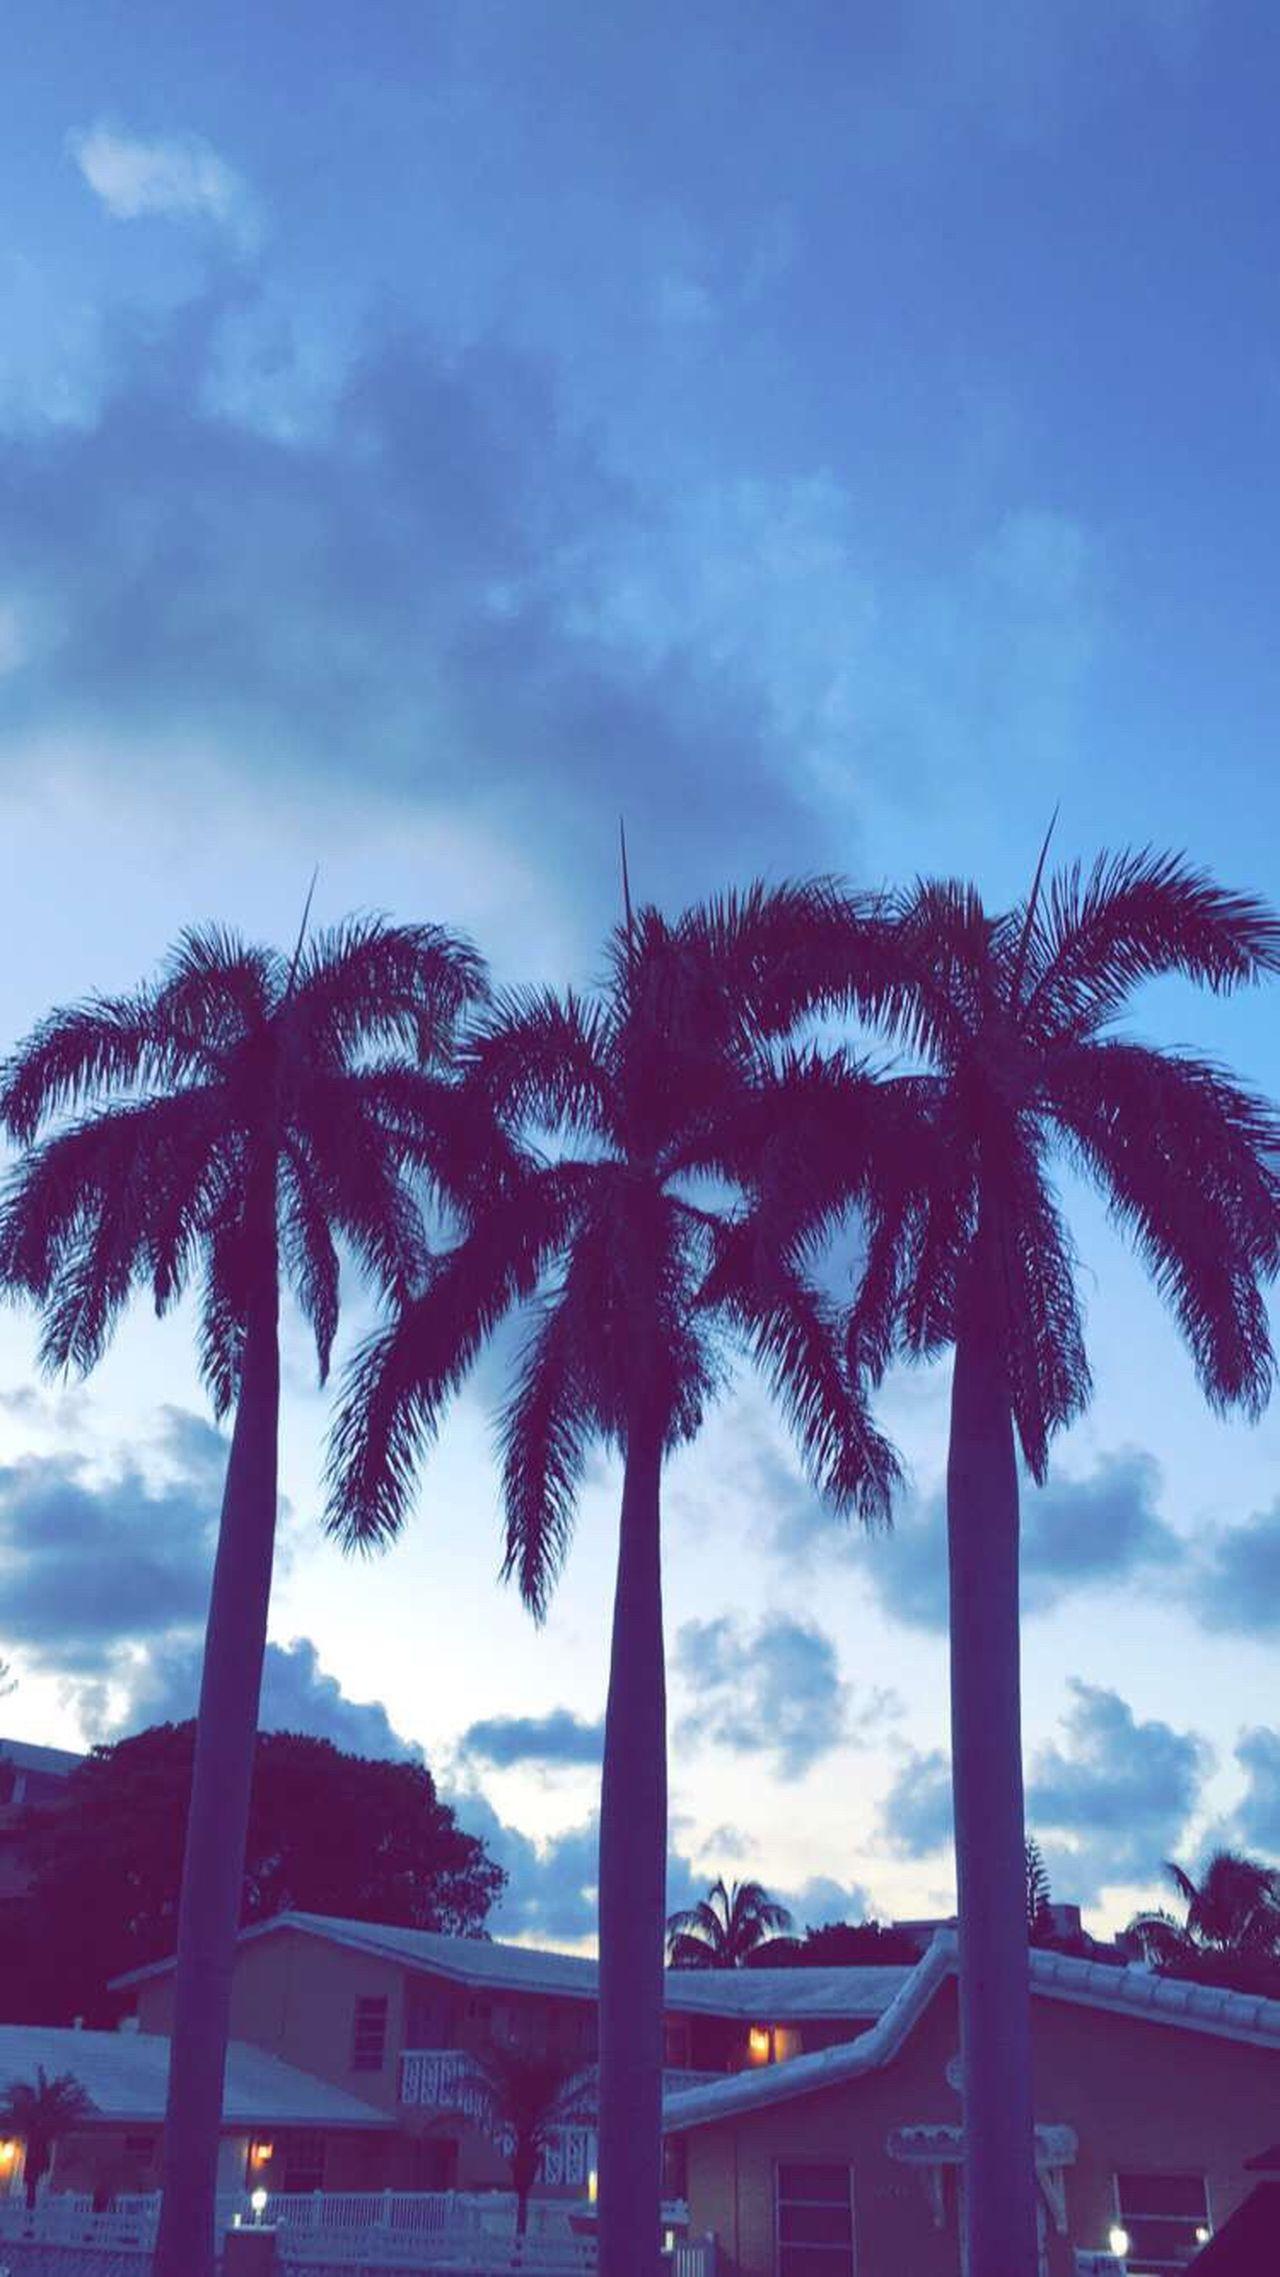 I miss these three palm trees. Hello World Taking Photos Palm Trees